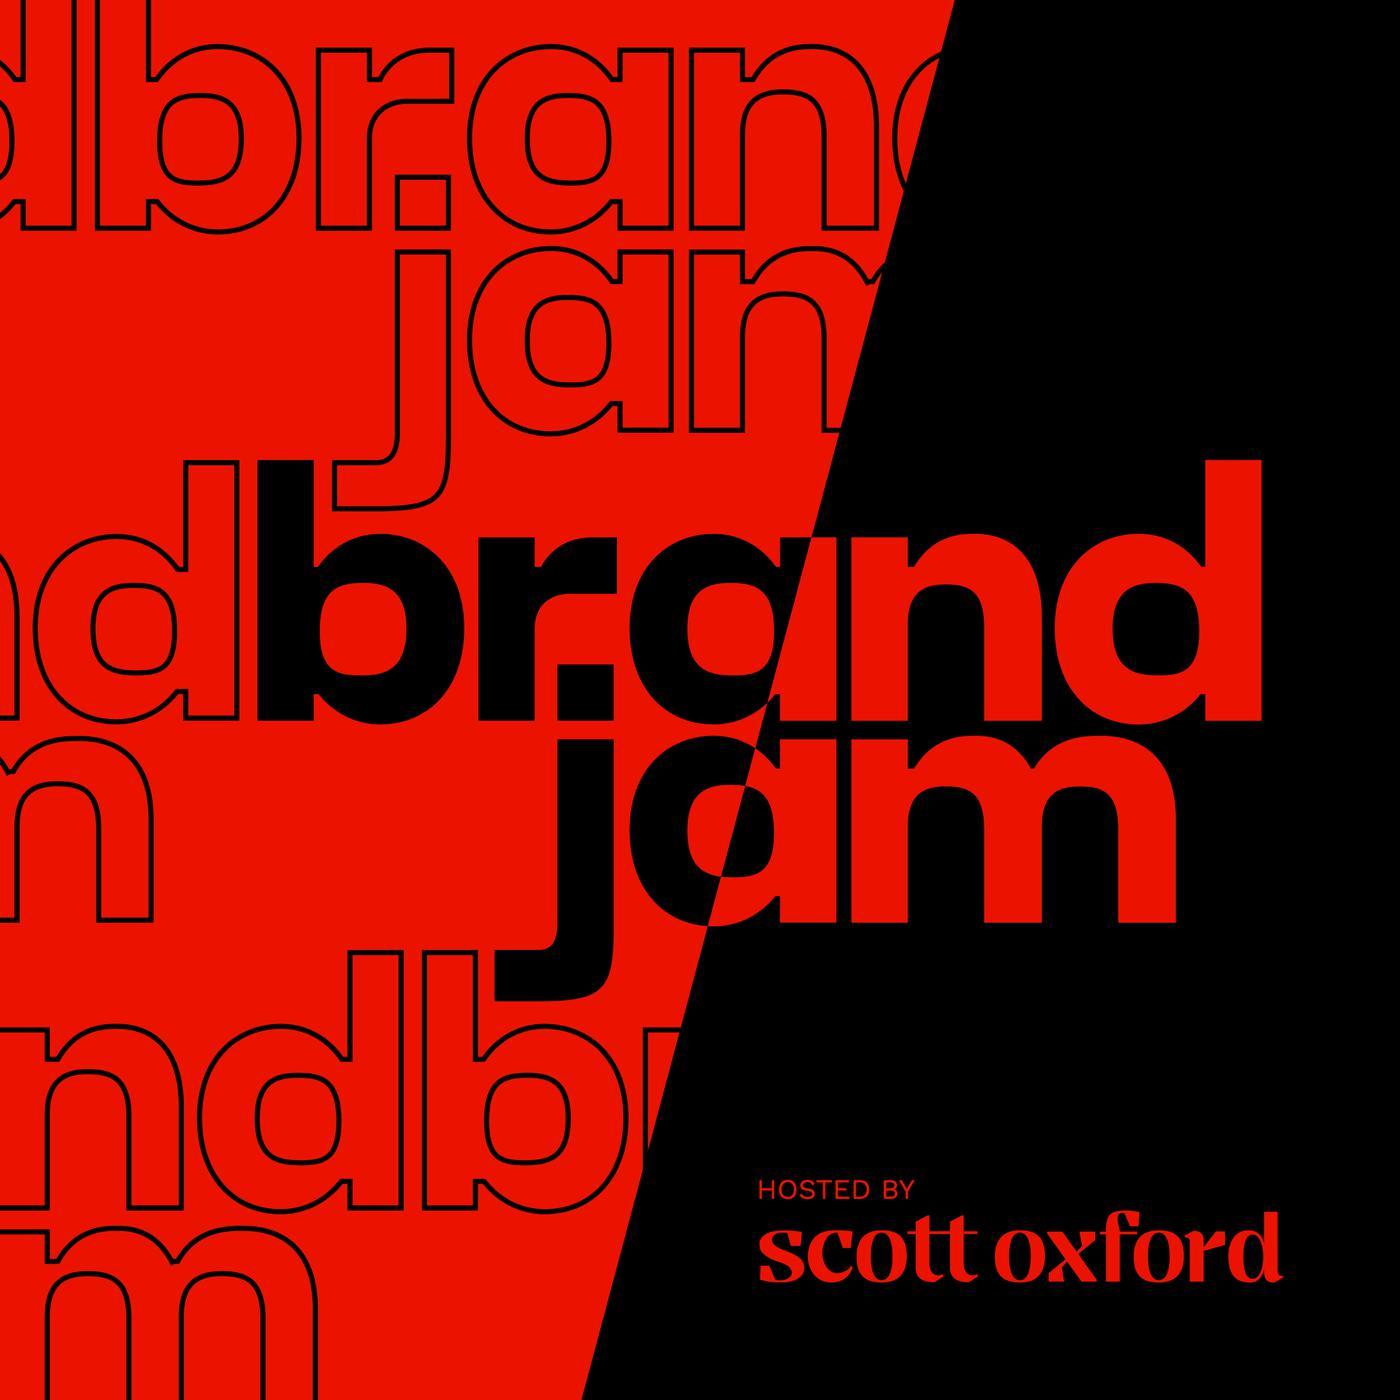 Podcast cover art from BrandJam hosted by Scott Oxford